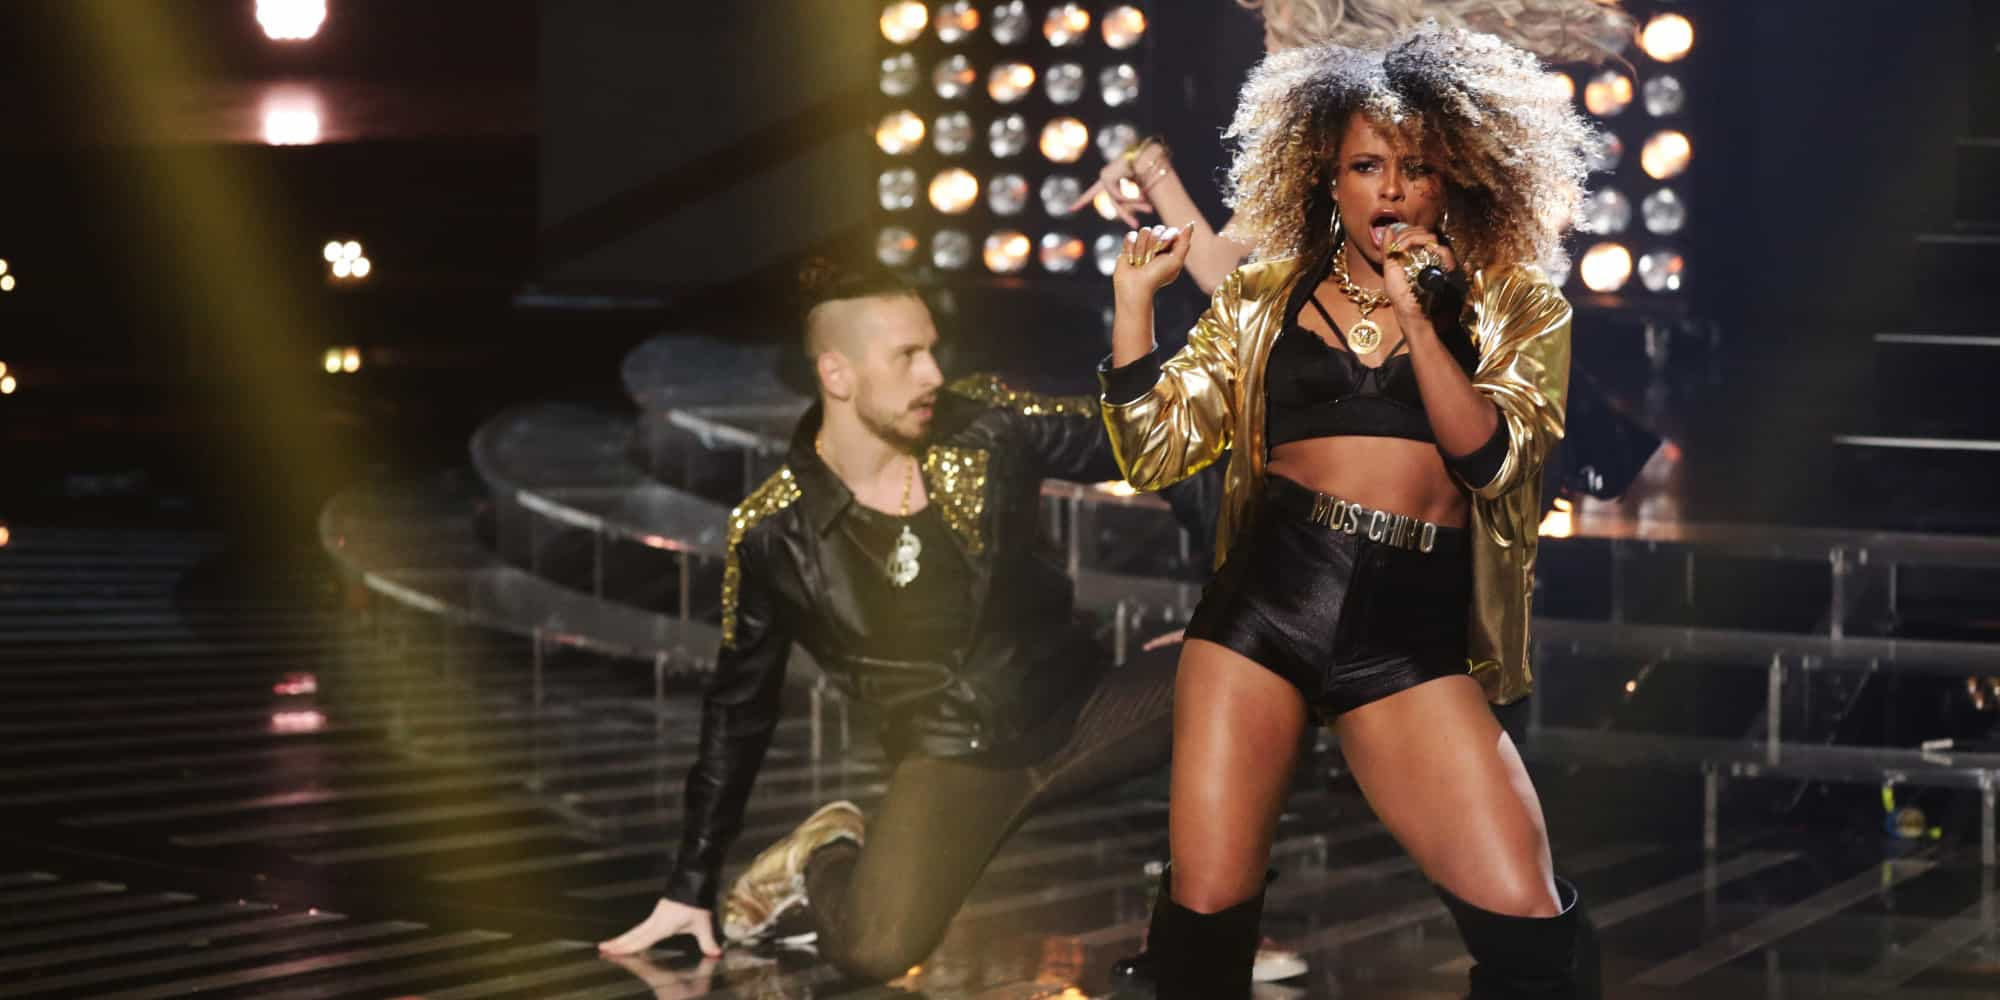 The X Factor - Saturday 6 December 2014